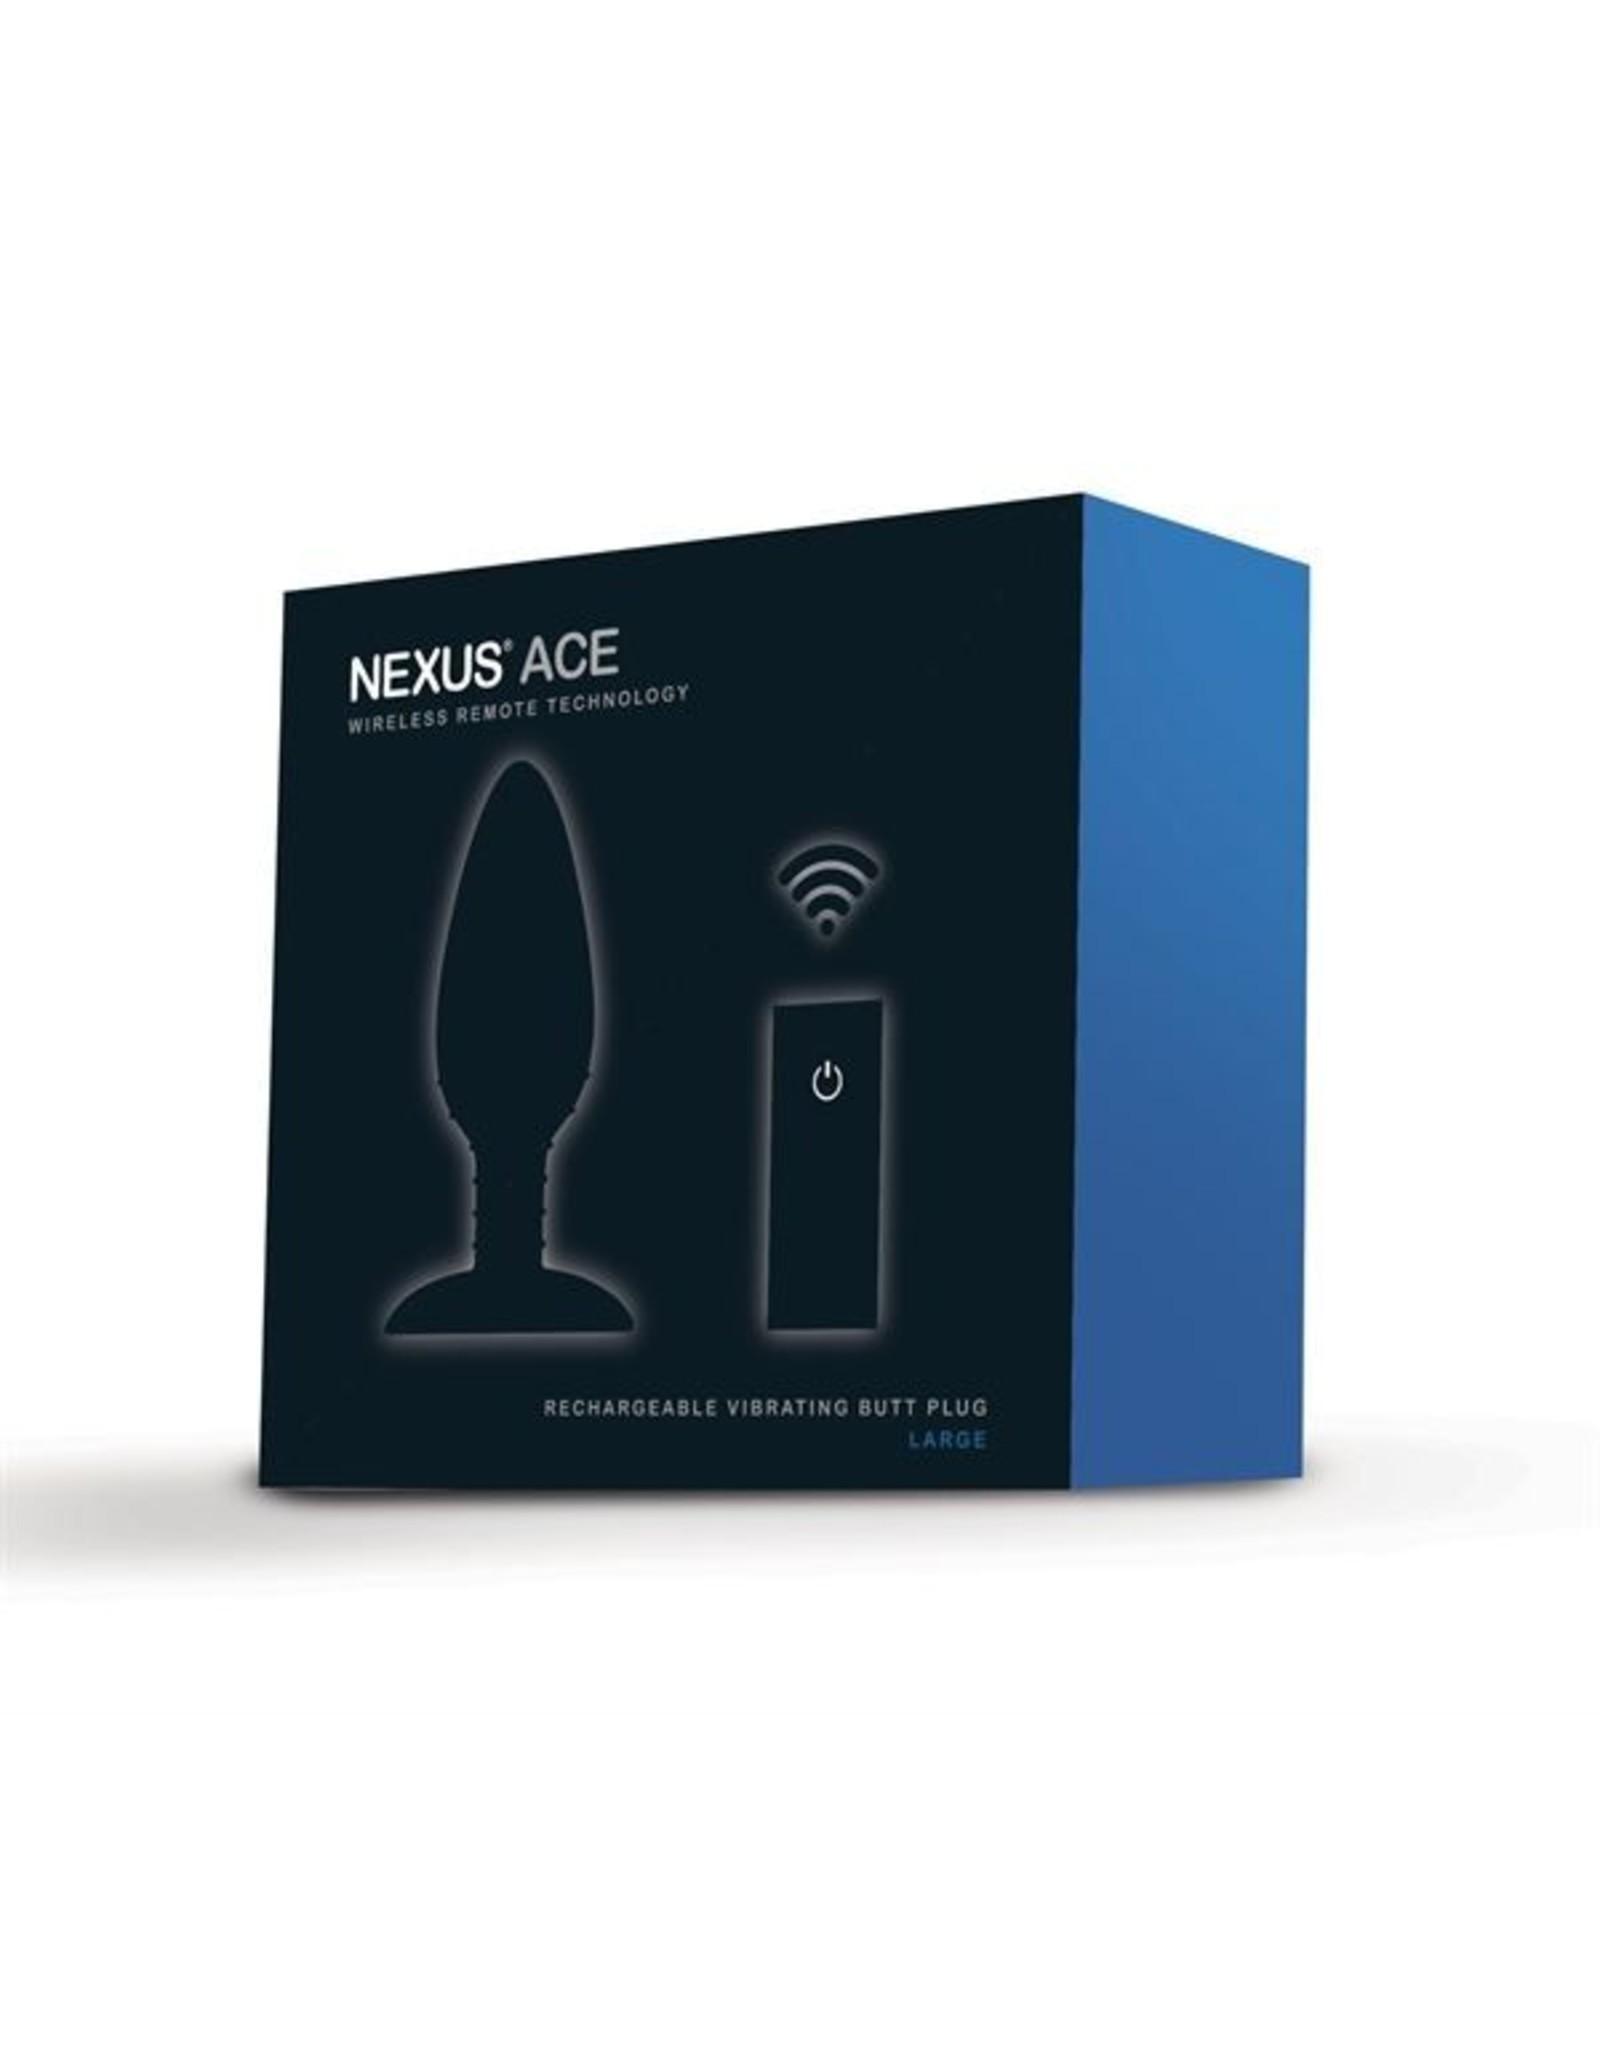 Nexus Ace Vibrating Butt Plug - Large